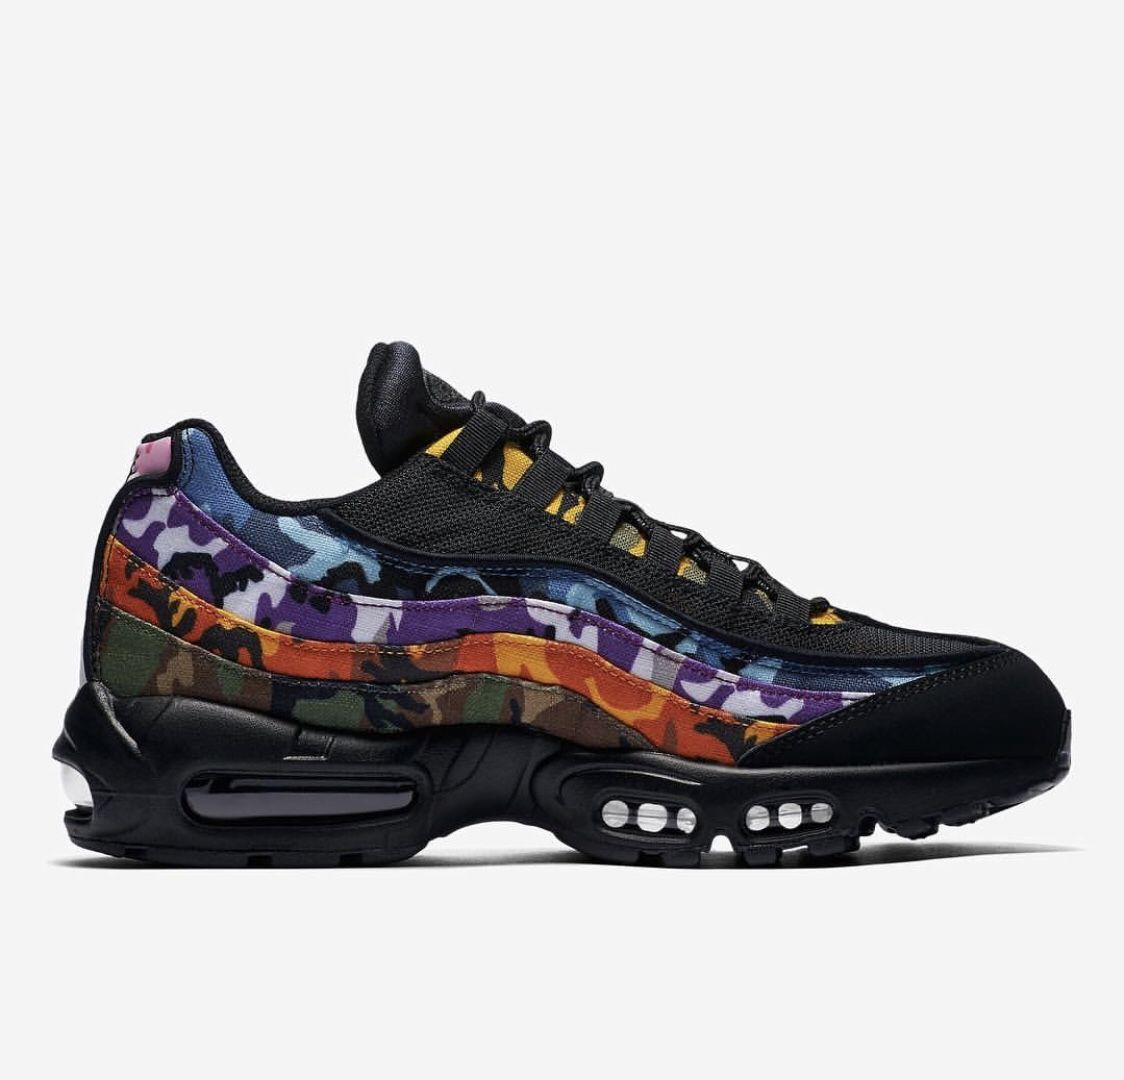 new style 9e93d 5fd5a Nike AirMax 95  Kicks (Sneakers) in 2019  Pinterest  Sneaker